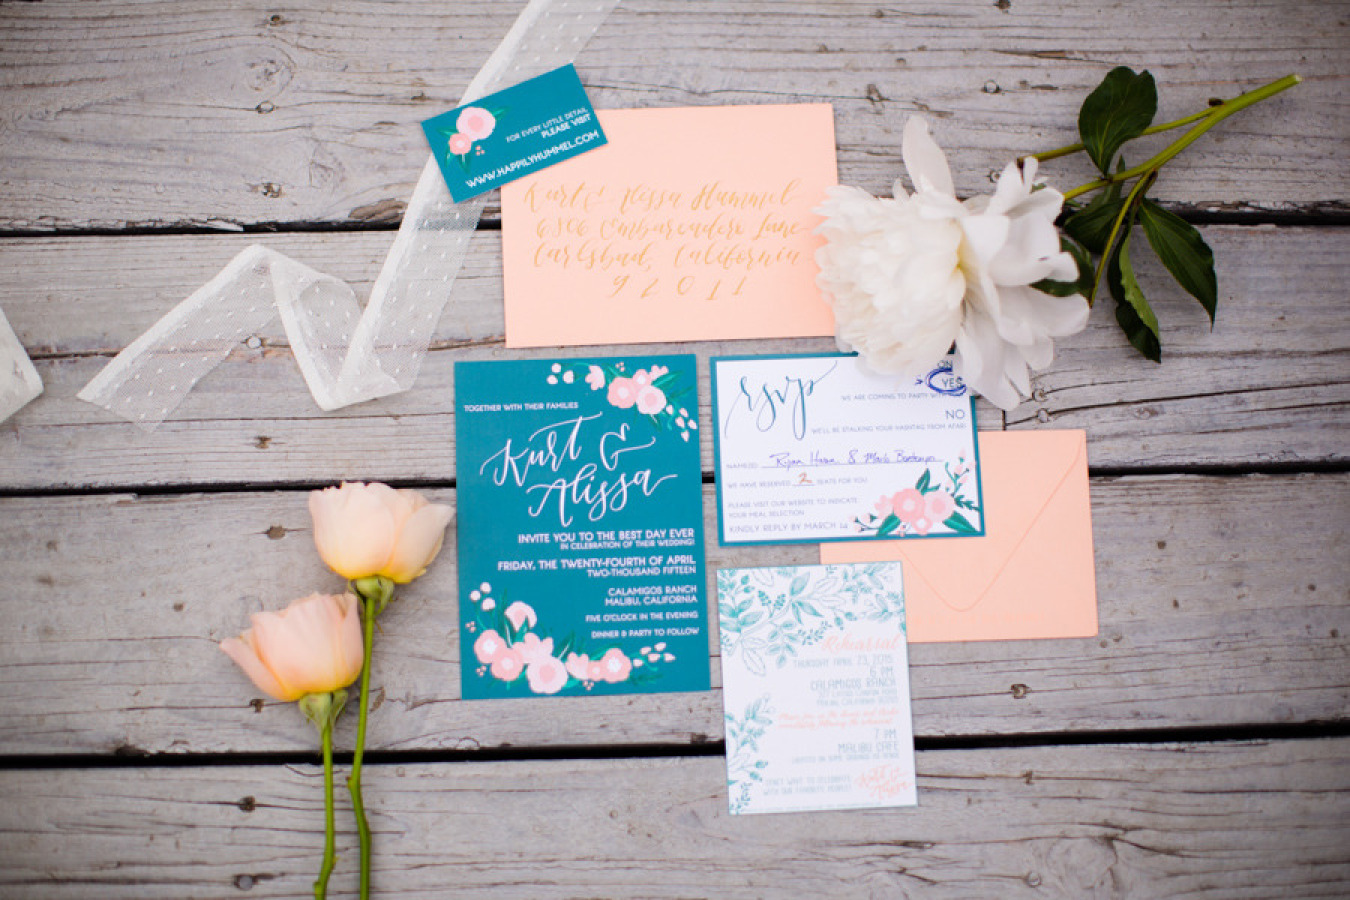 Jade and peach wedding invitations